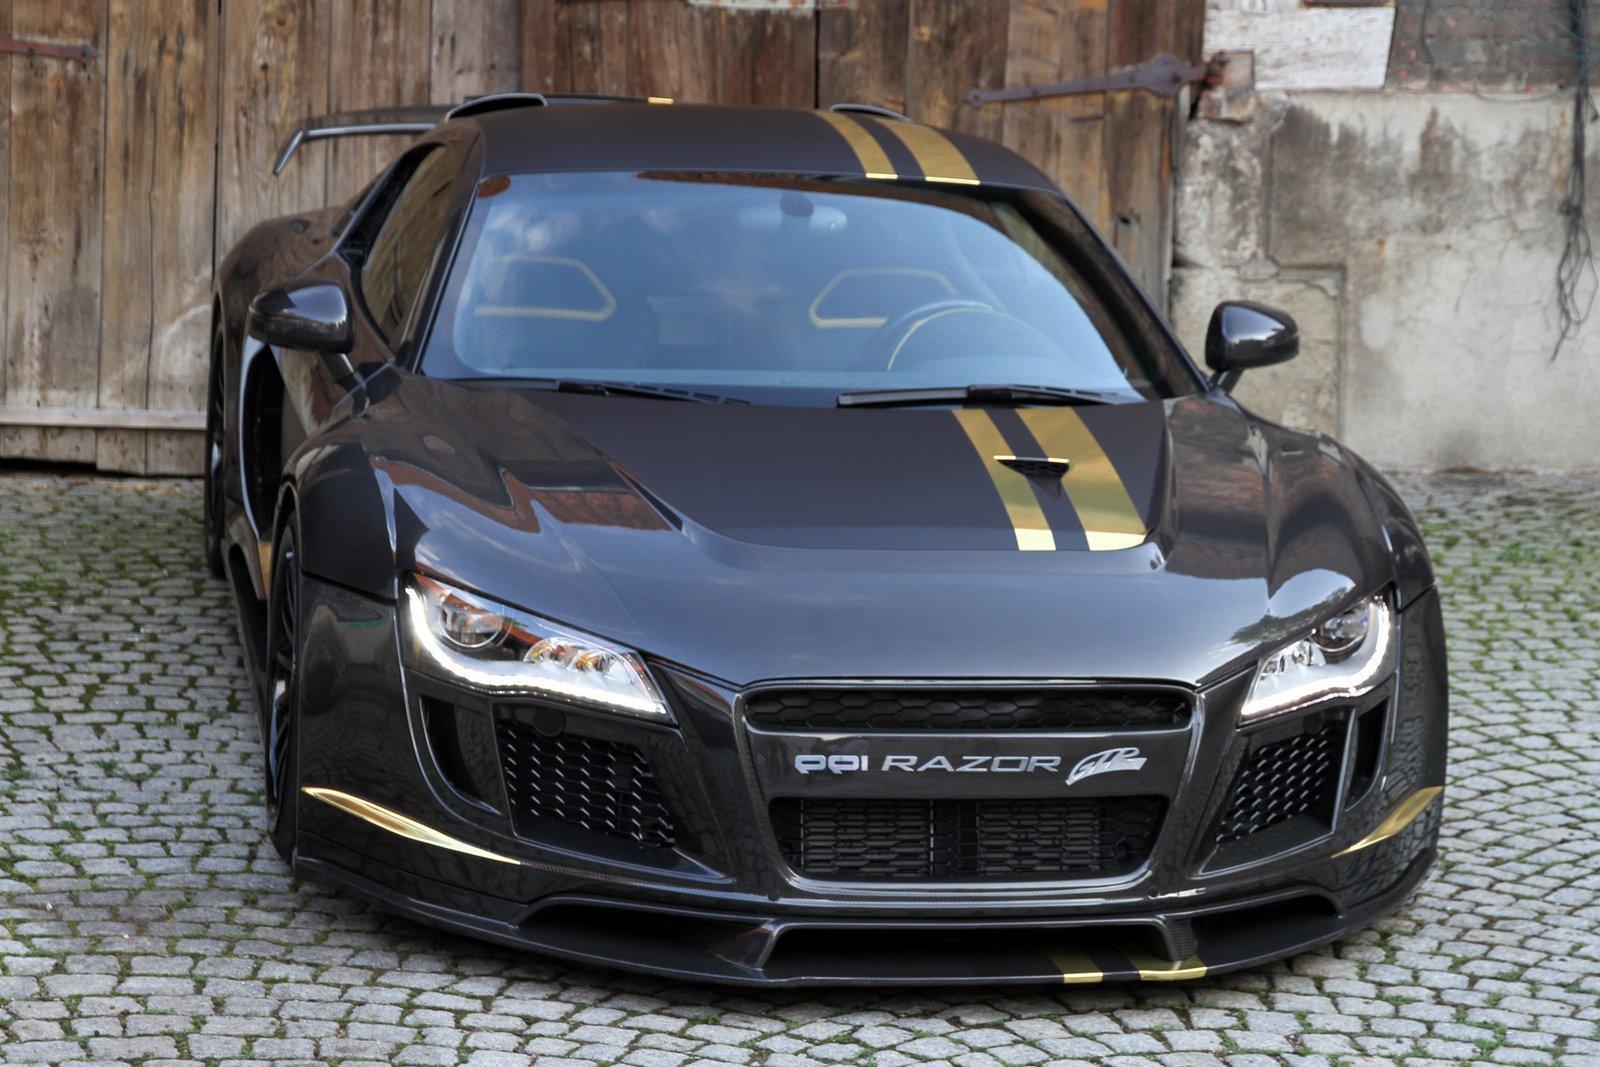 http://1.bp.blogspot.com/-_-YStLIECnk/Tgj3HLAMHJI/AAAAAAAAA6s/vaz9AlIKt0Q/s1600/PPI+GTR-10+Limited+Edition+Audi+R8+2.jpg